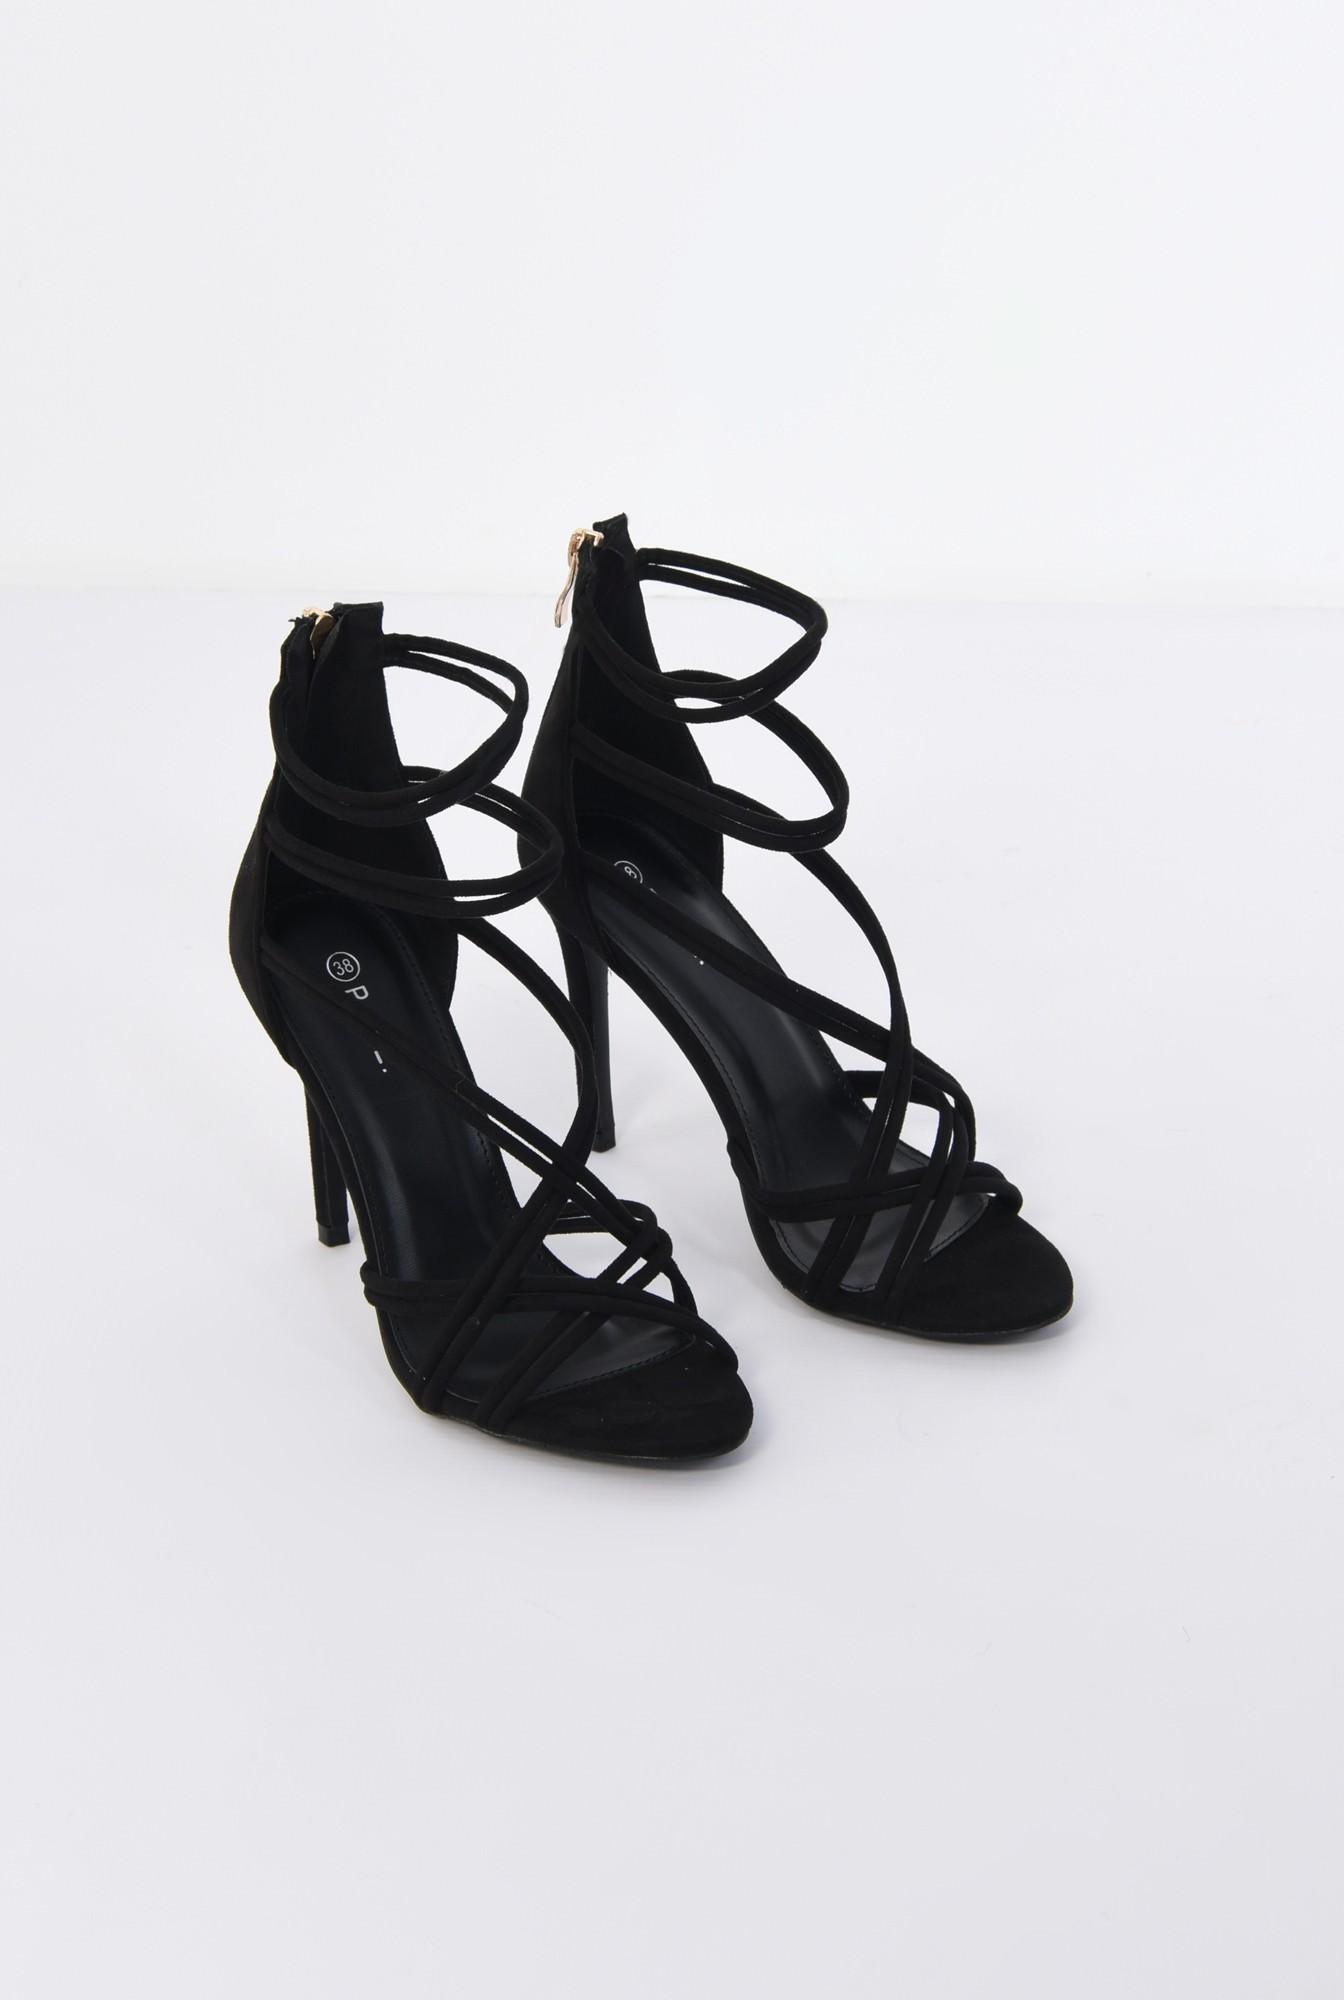 1 - sandale elegante, negre, catifea, stiletto